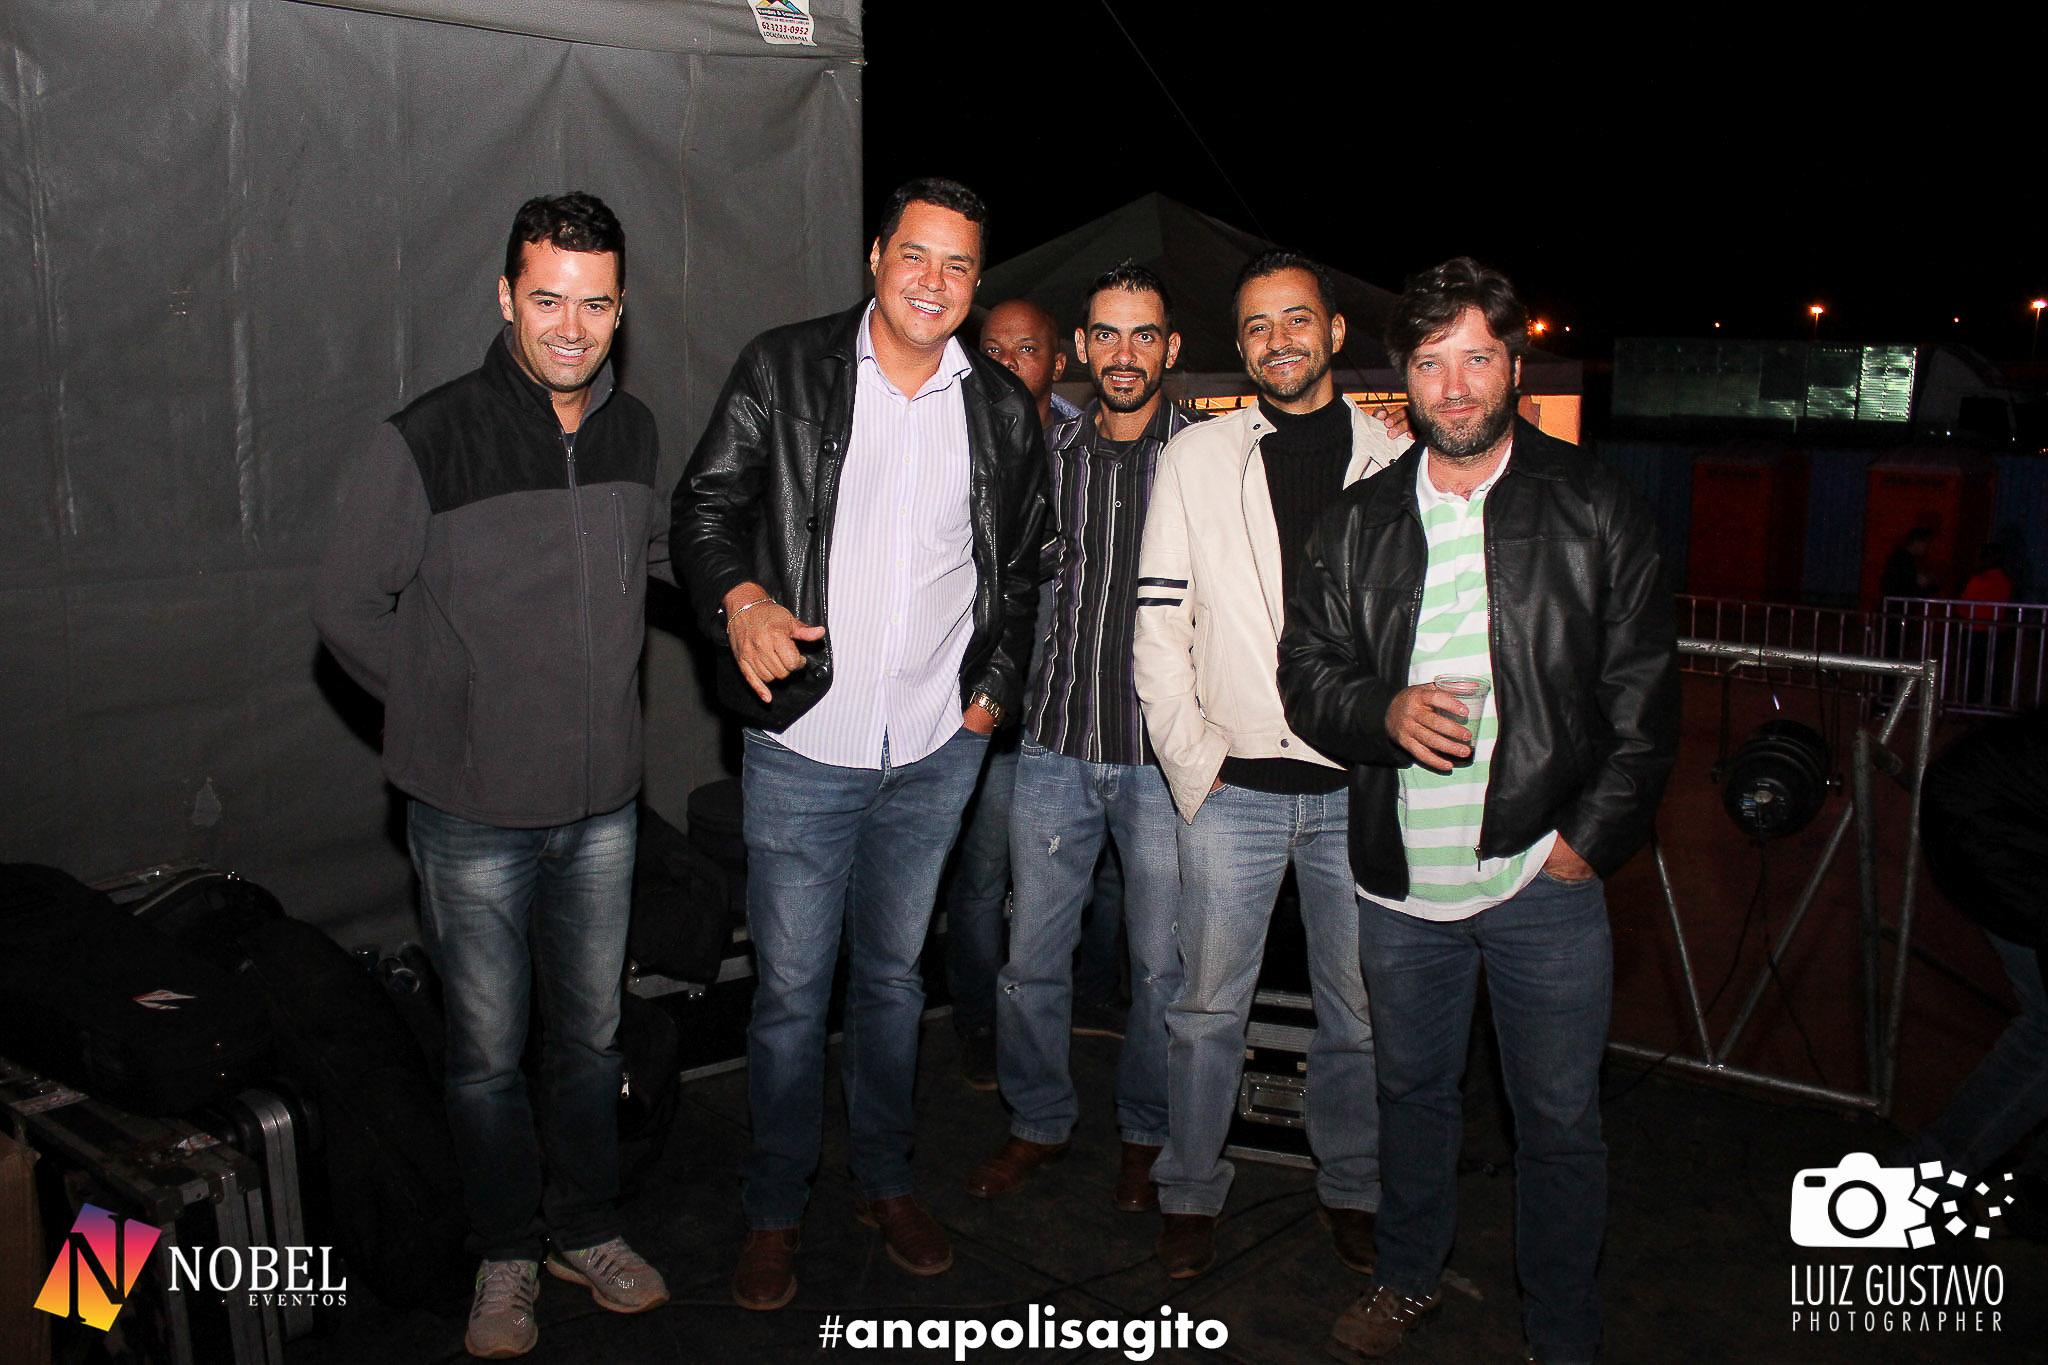 Luiz Gustavo Photographer-253